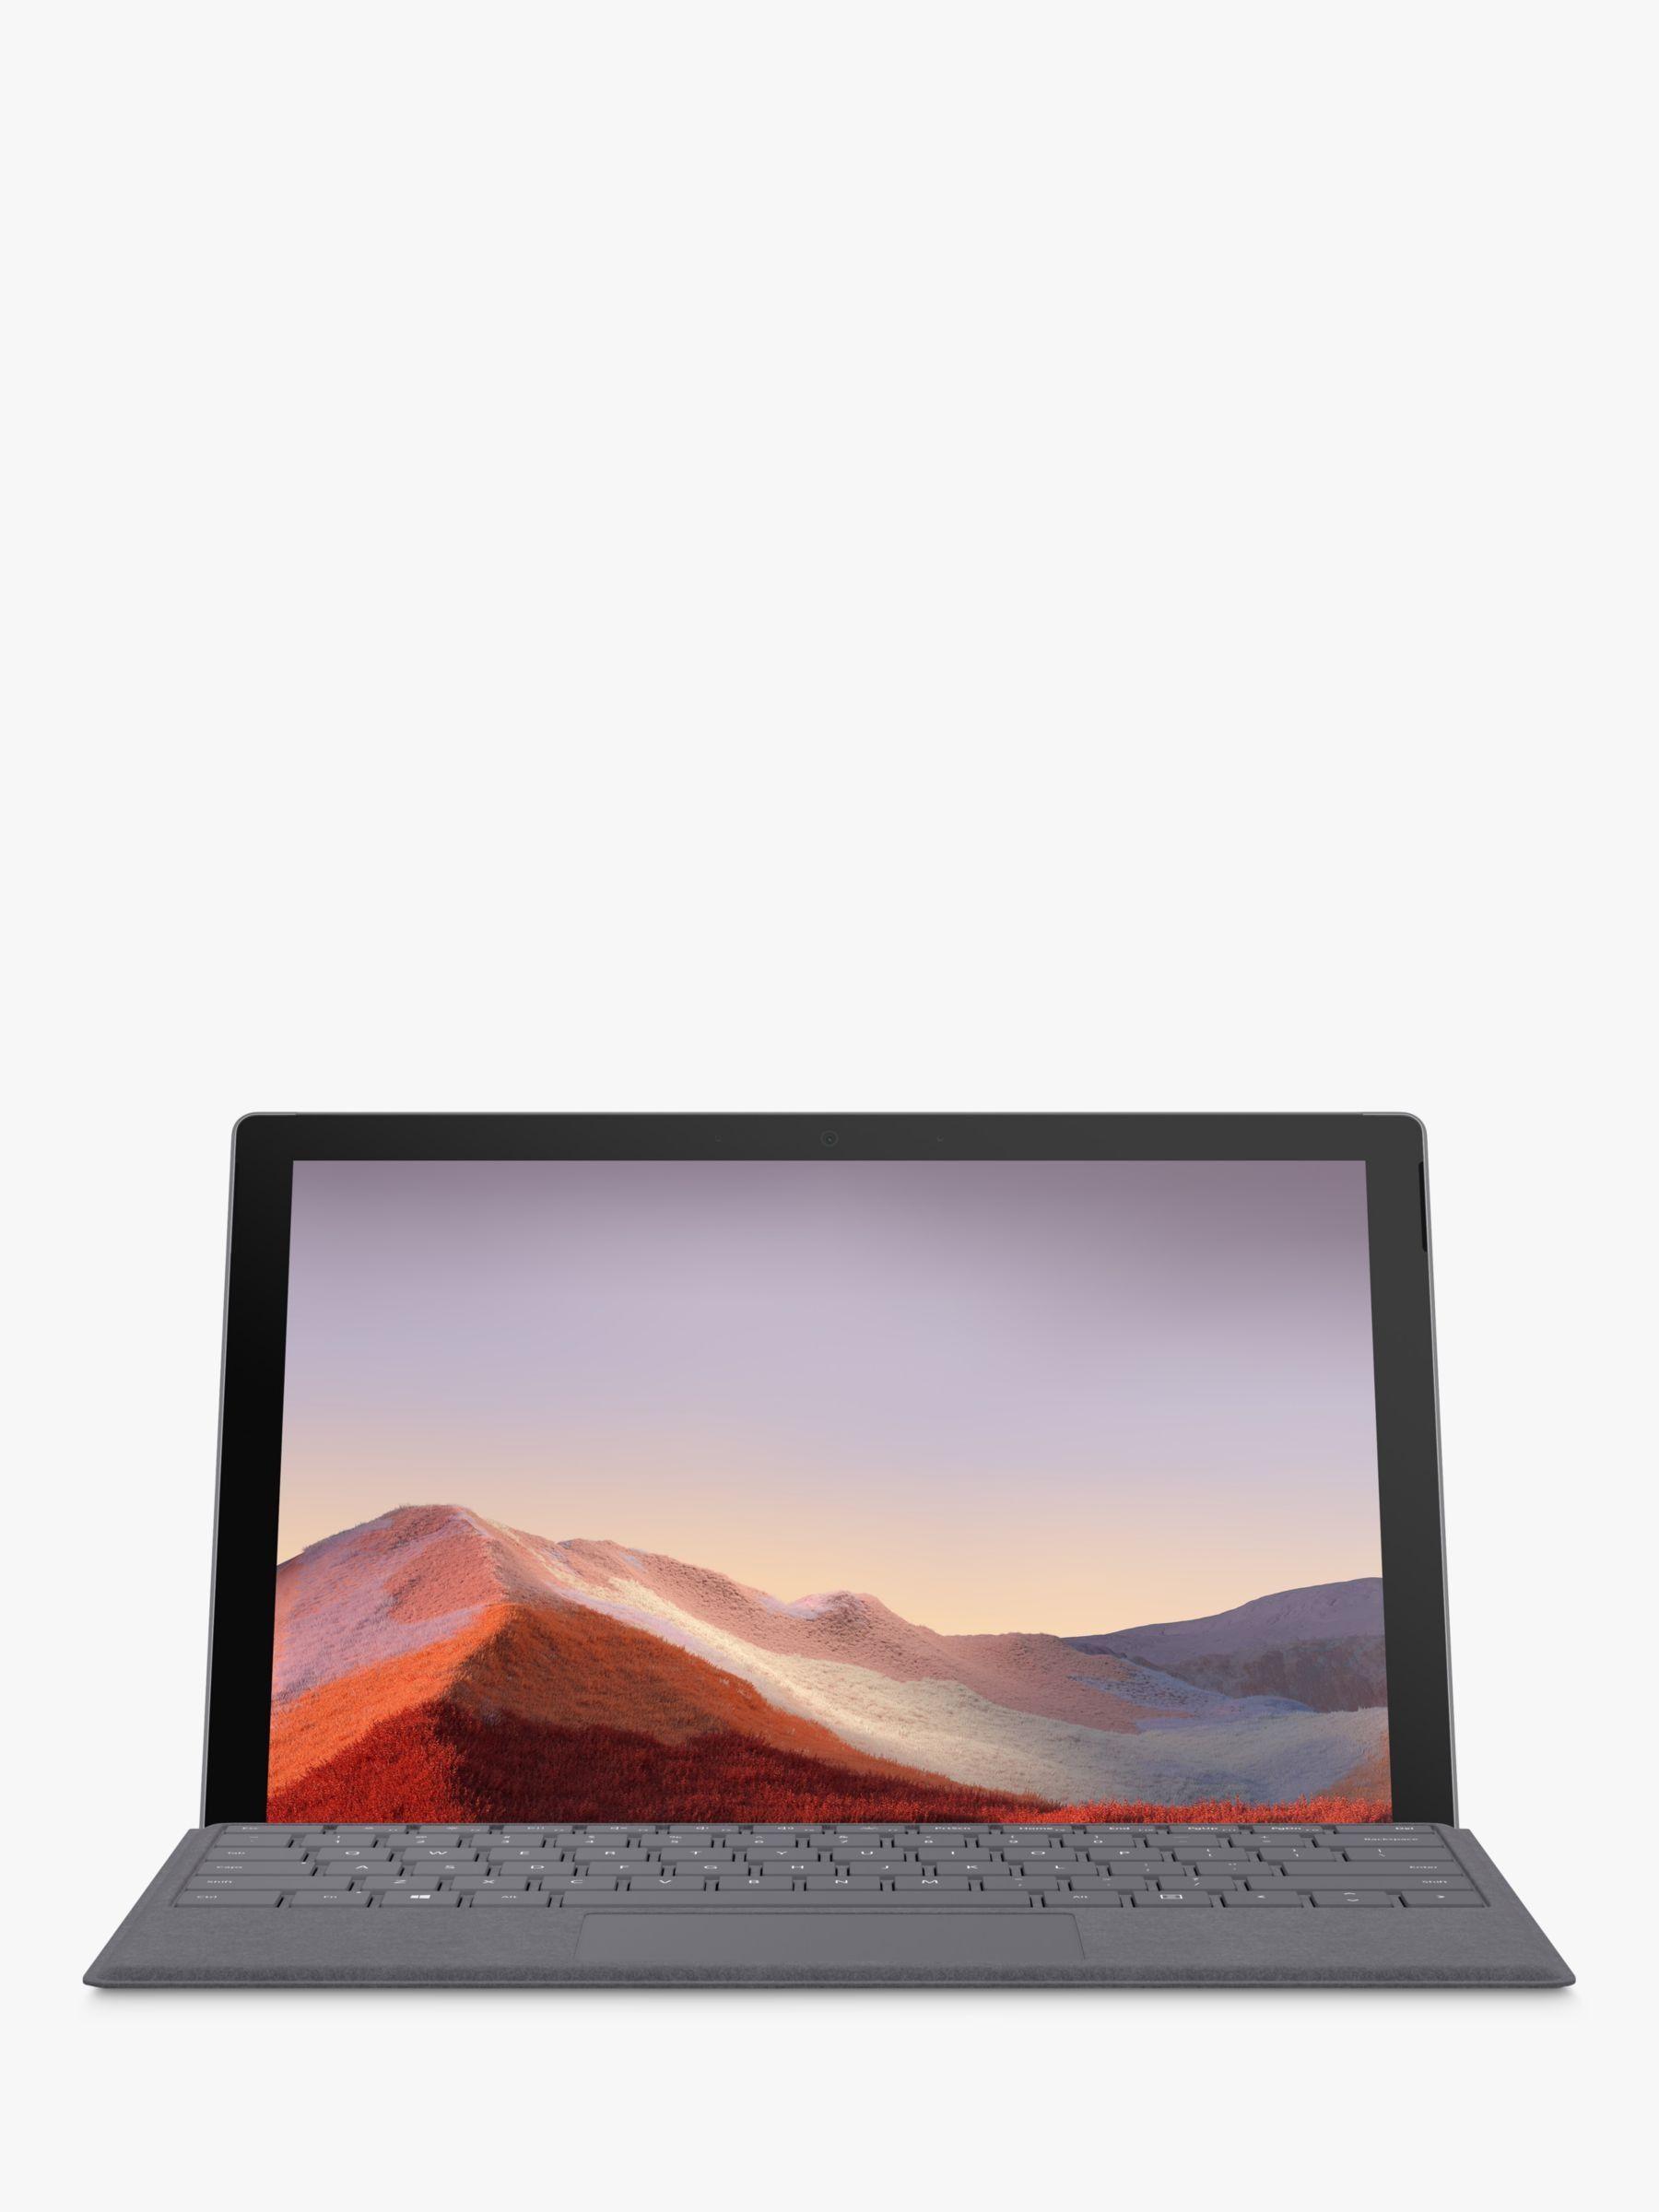 Microsoft Surface Pro 7 Tablet, Intel Core i5 Processor